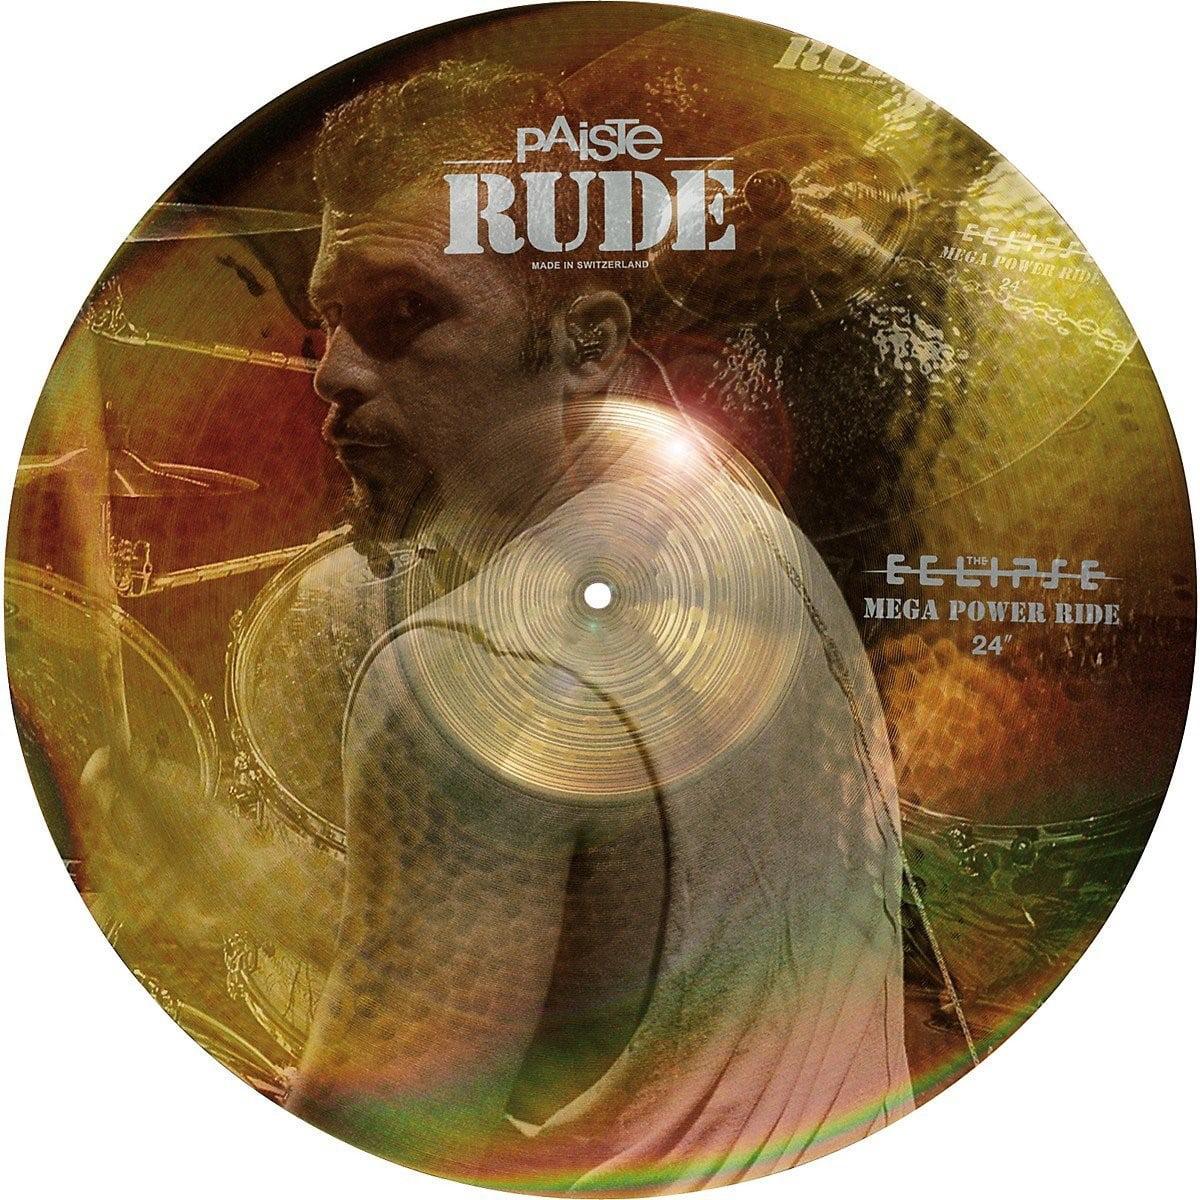 "Paiste Rude Mega Power Ride Cymbal 24"" by Paiste"